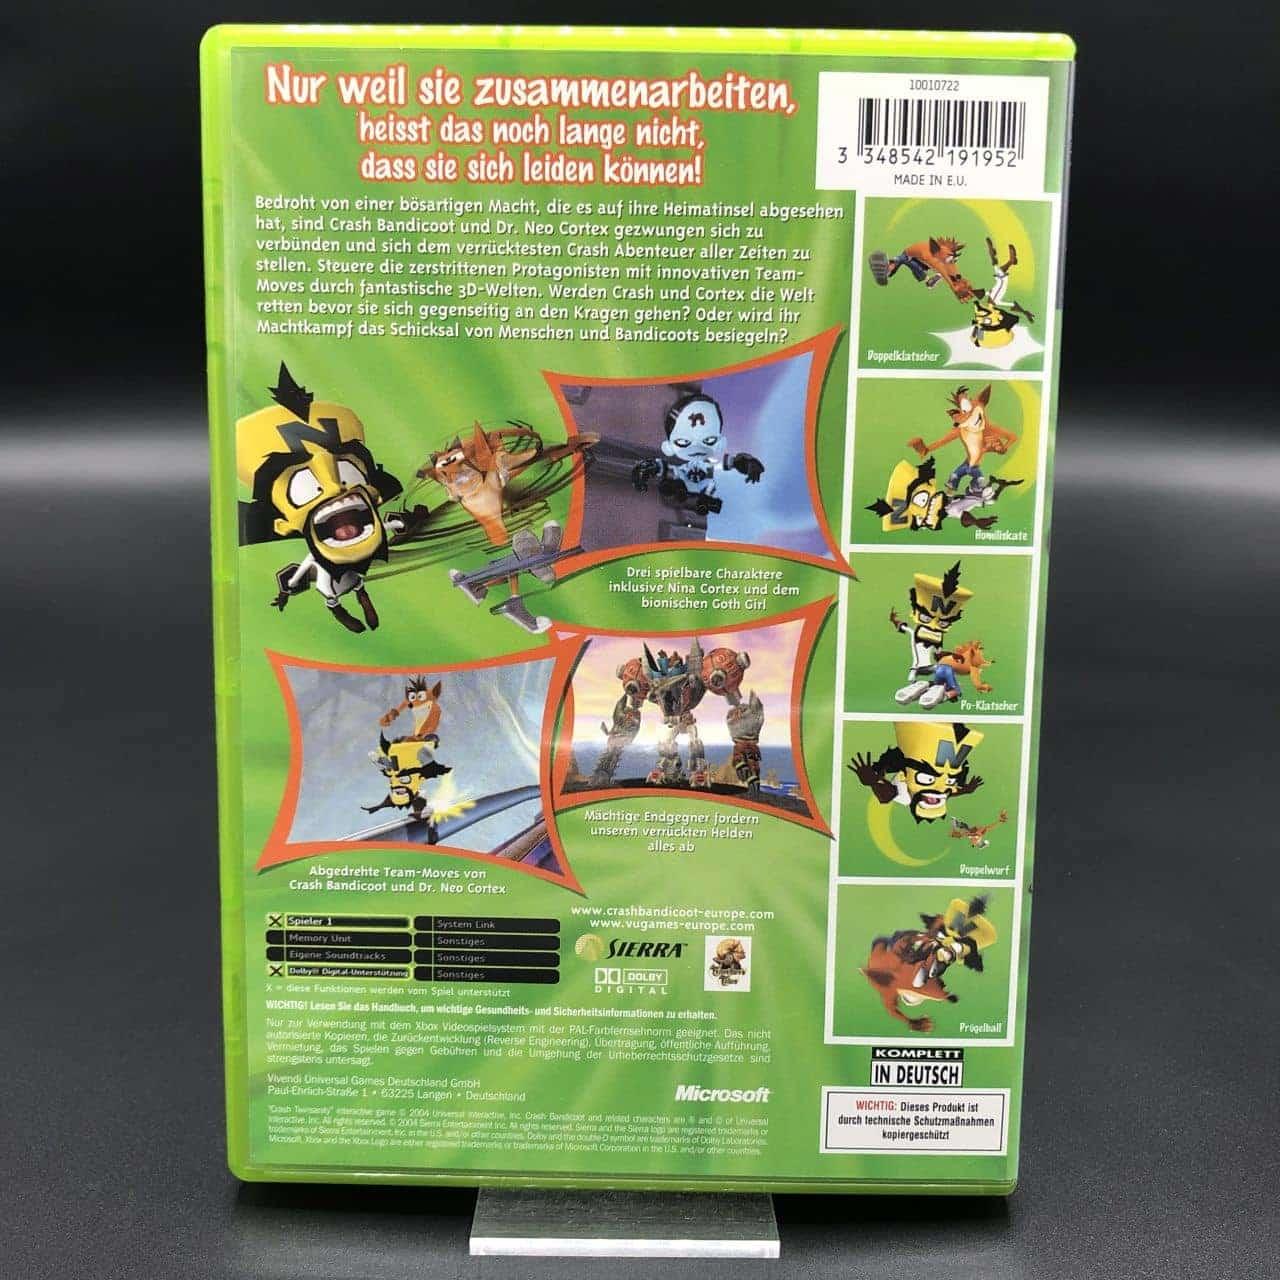 XBC Crash TwinSanity (Komplett) (Sehr gut) Microsoft Xbox Classic